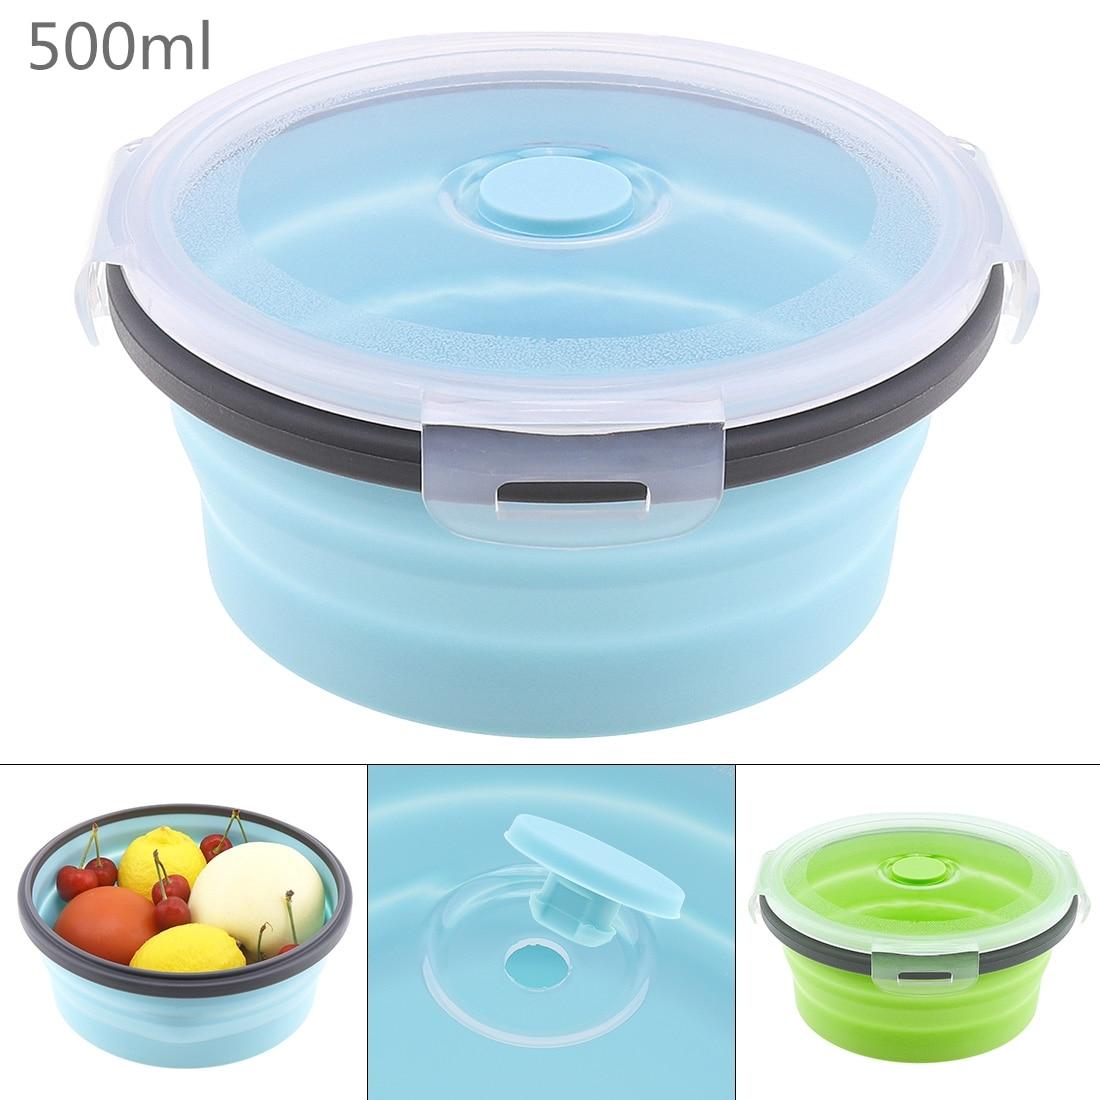 500ML Portable Circular Silicone Scalable Folding Lunchbox Bento Box with Silicone Sealing Plug for - 40~230 Centigrade